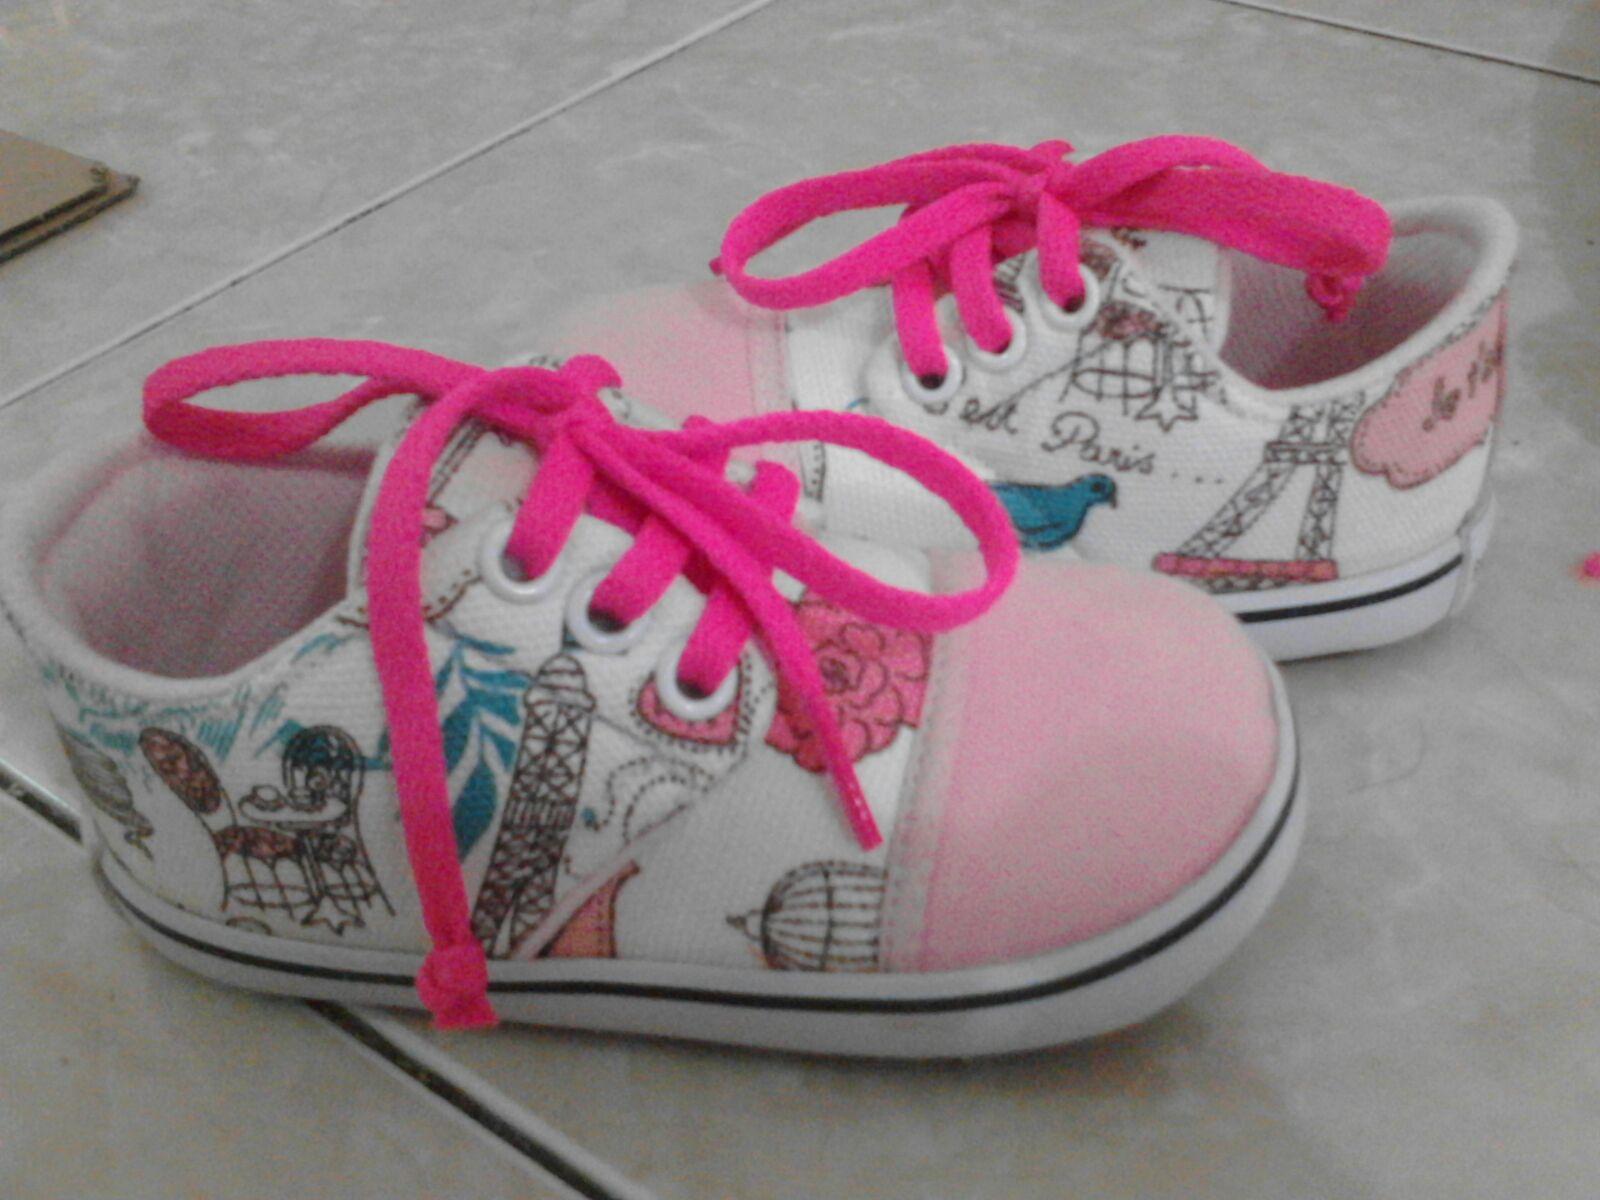 Grosir Sepatu Dan Sandal Anak Produsen Agen Distributor Grosir